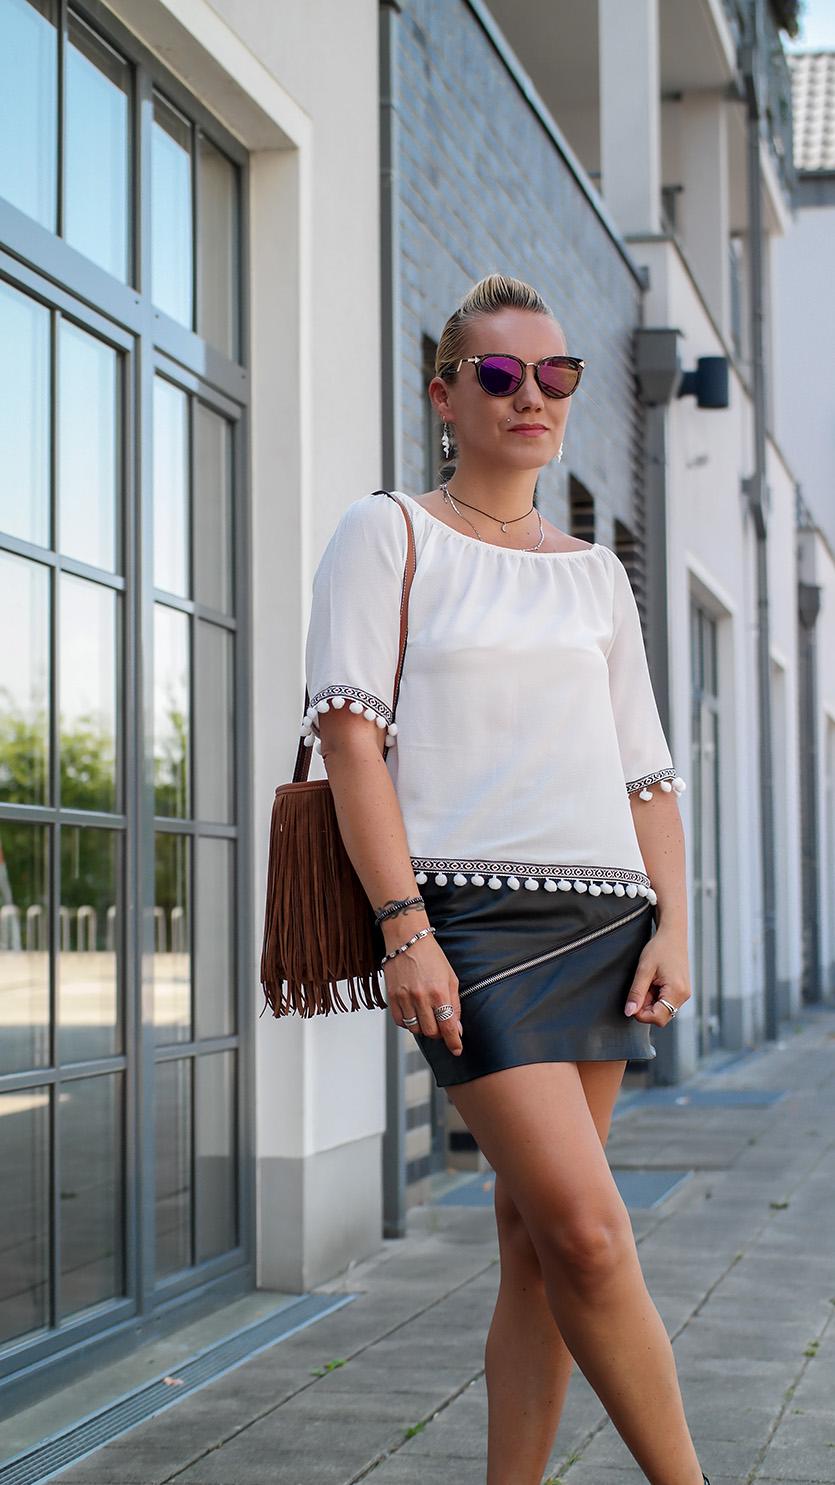 Sommerlook Outfit mit rockigem Lederrock von Zara, Pom Pom Bluse & Fransentasche | hot-port.de | 30+ Style Blog